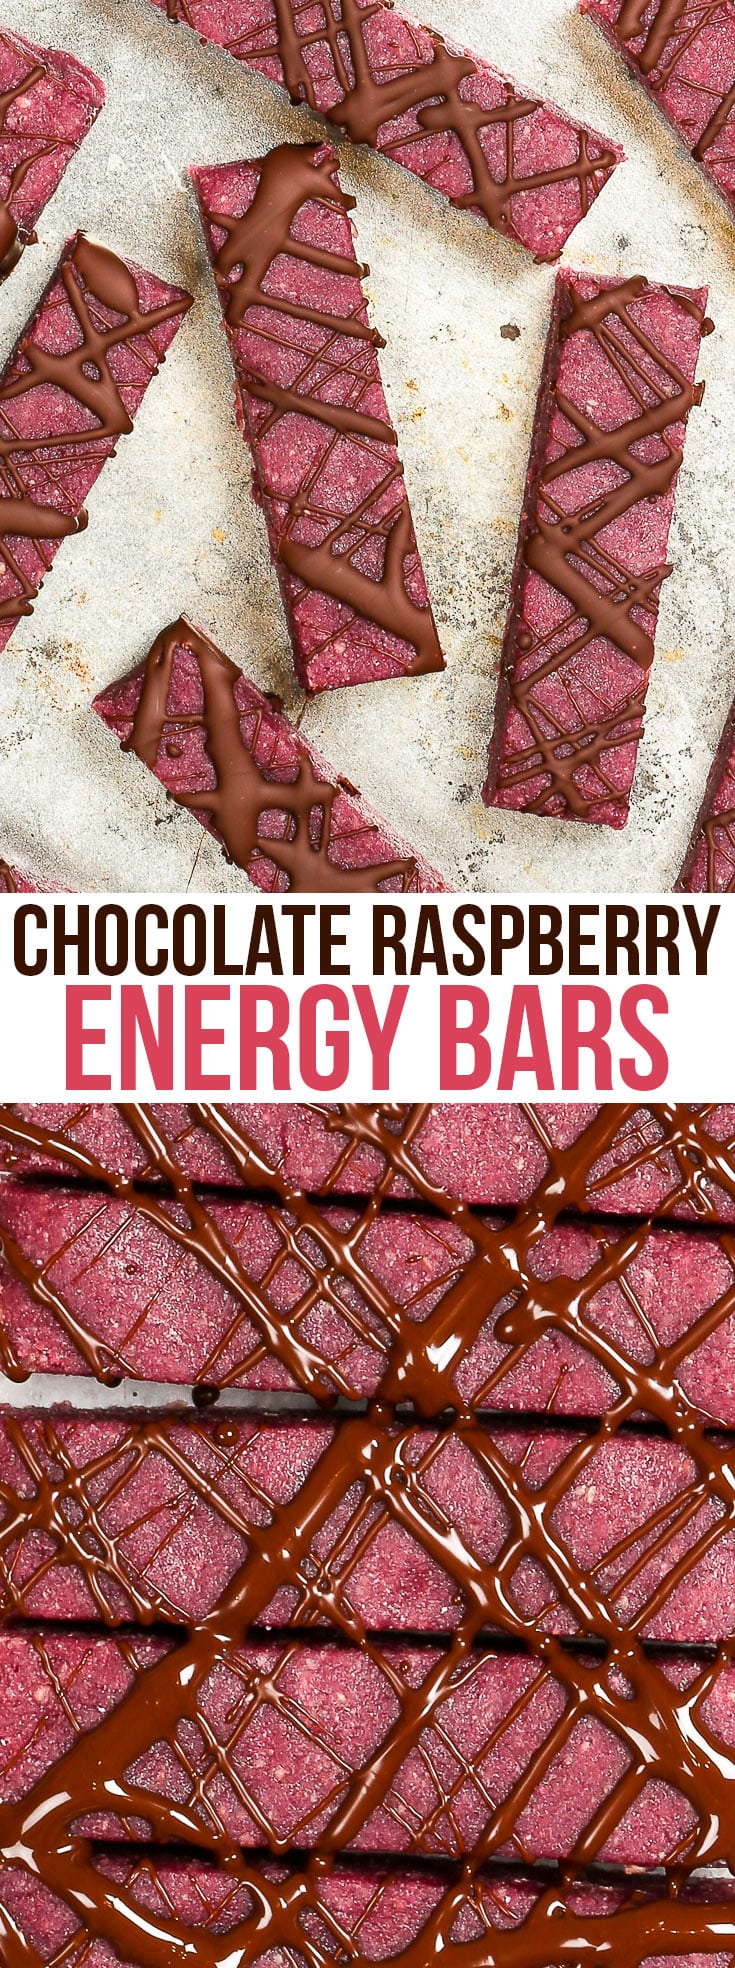 Chocolate Raspberry Energy Bars The Loopy Whisk